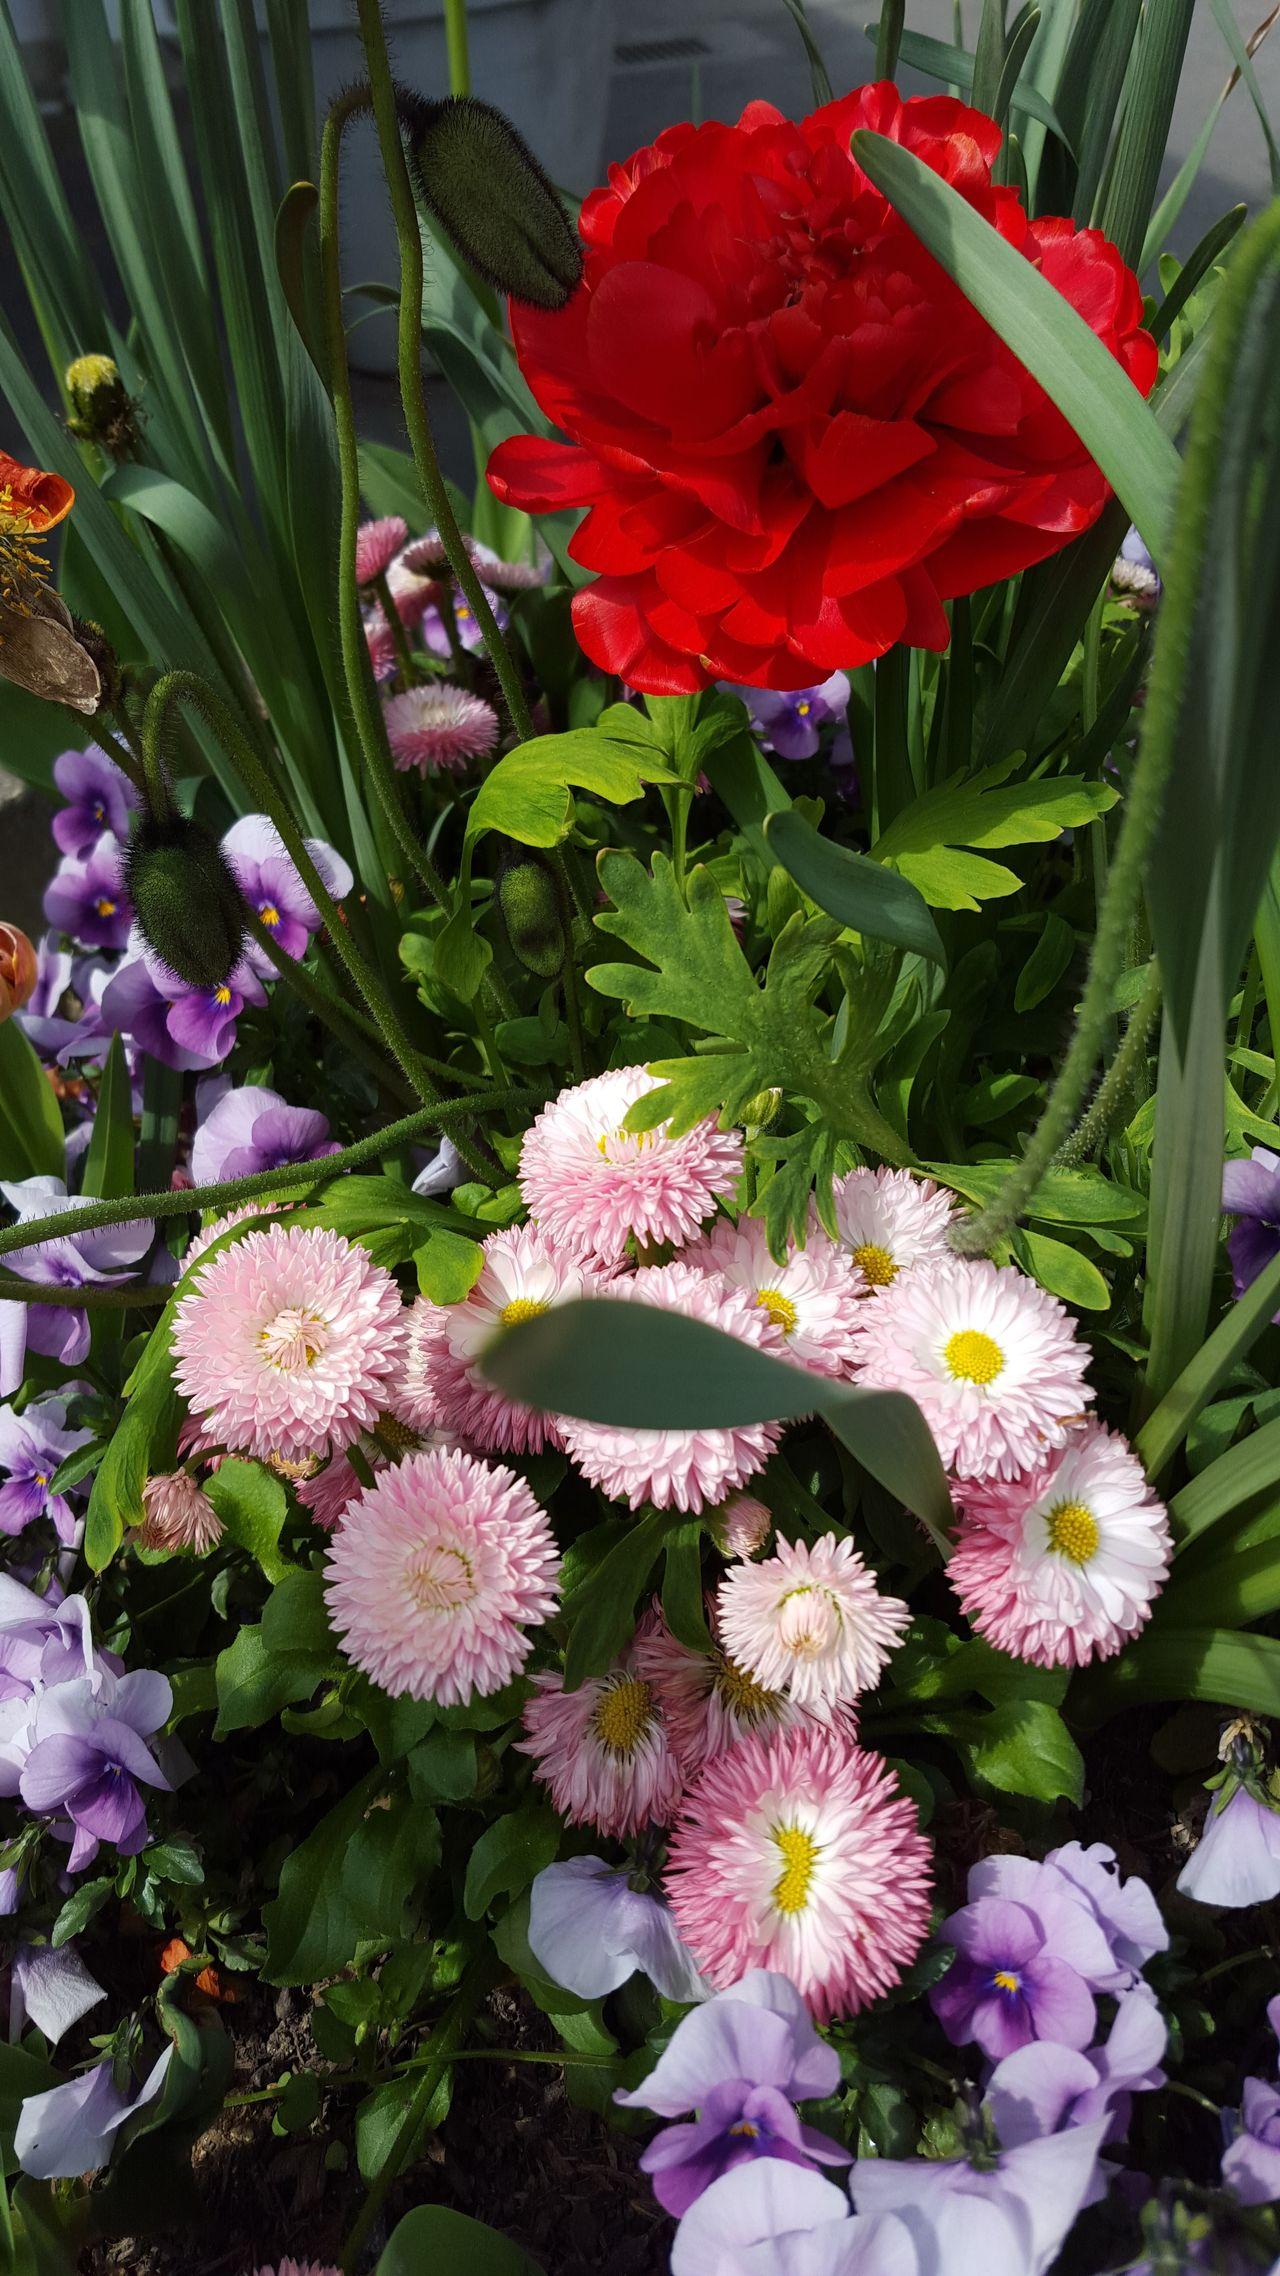 Flower Beauty In Nature Geneve Suisse  Printemps Geneve, Switzerland